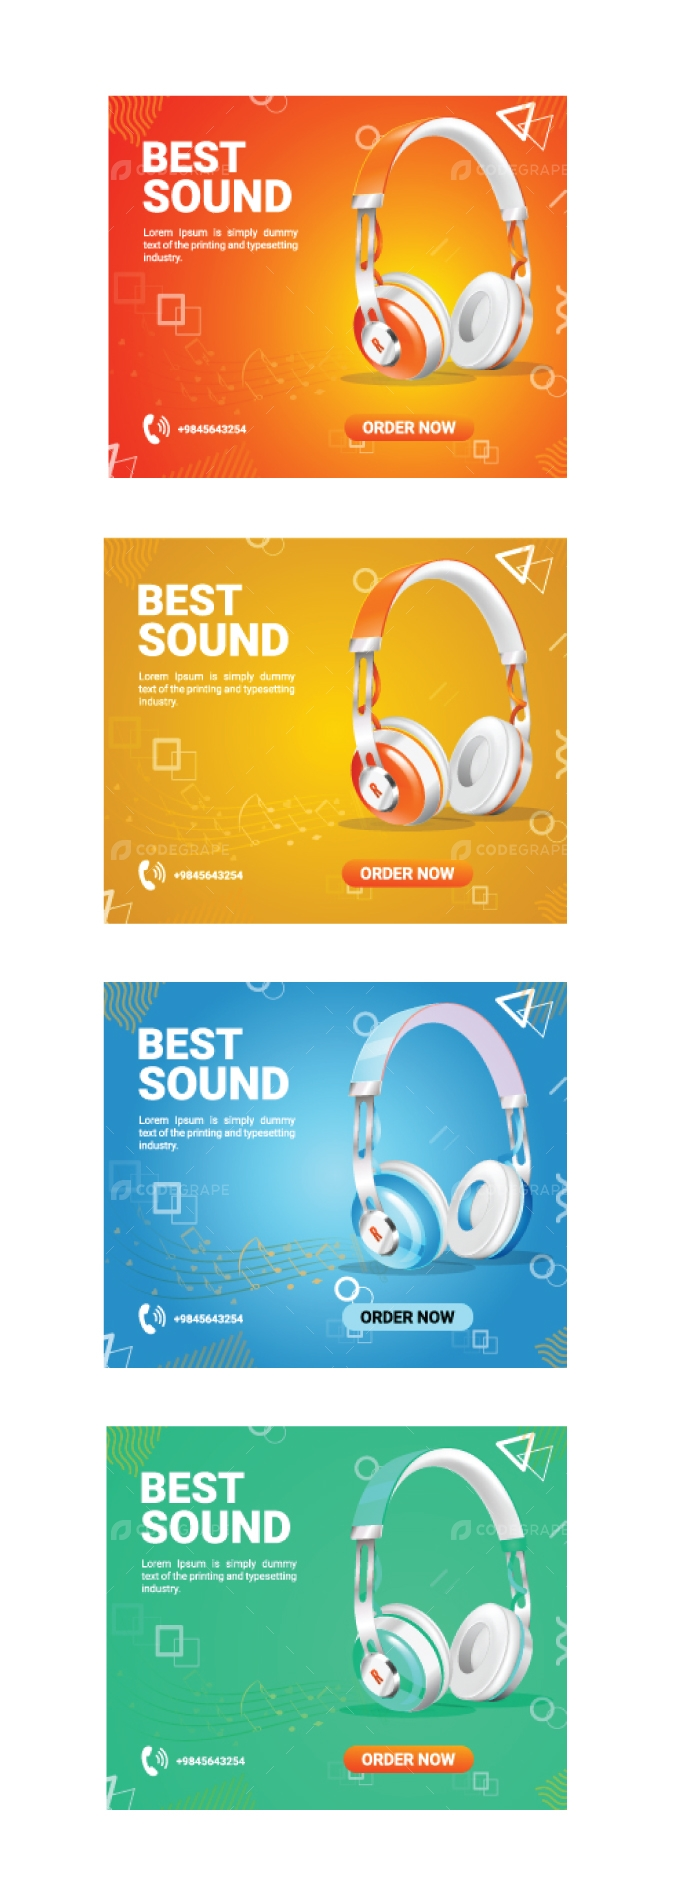 Social Media Ads Template Design